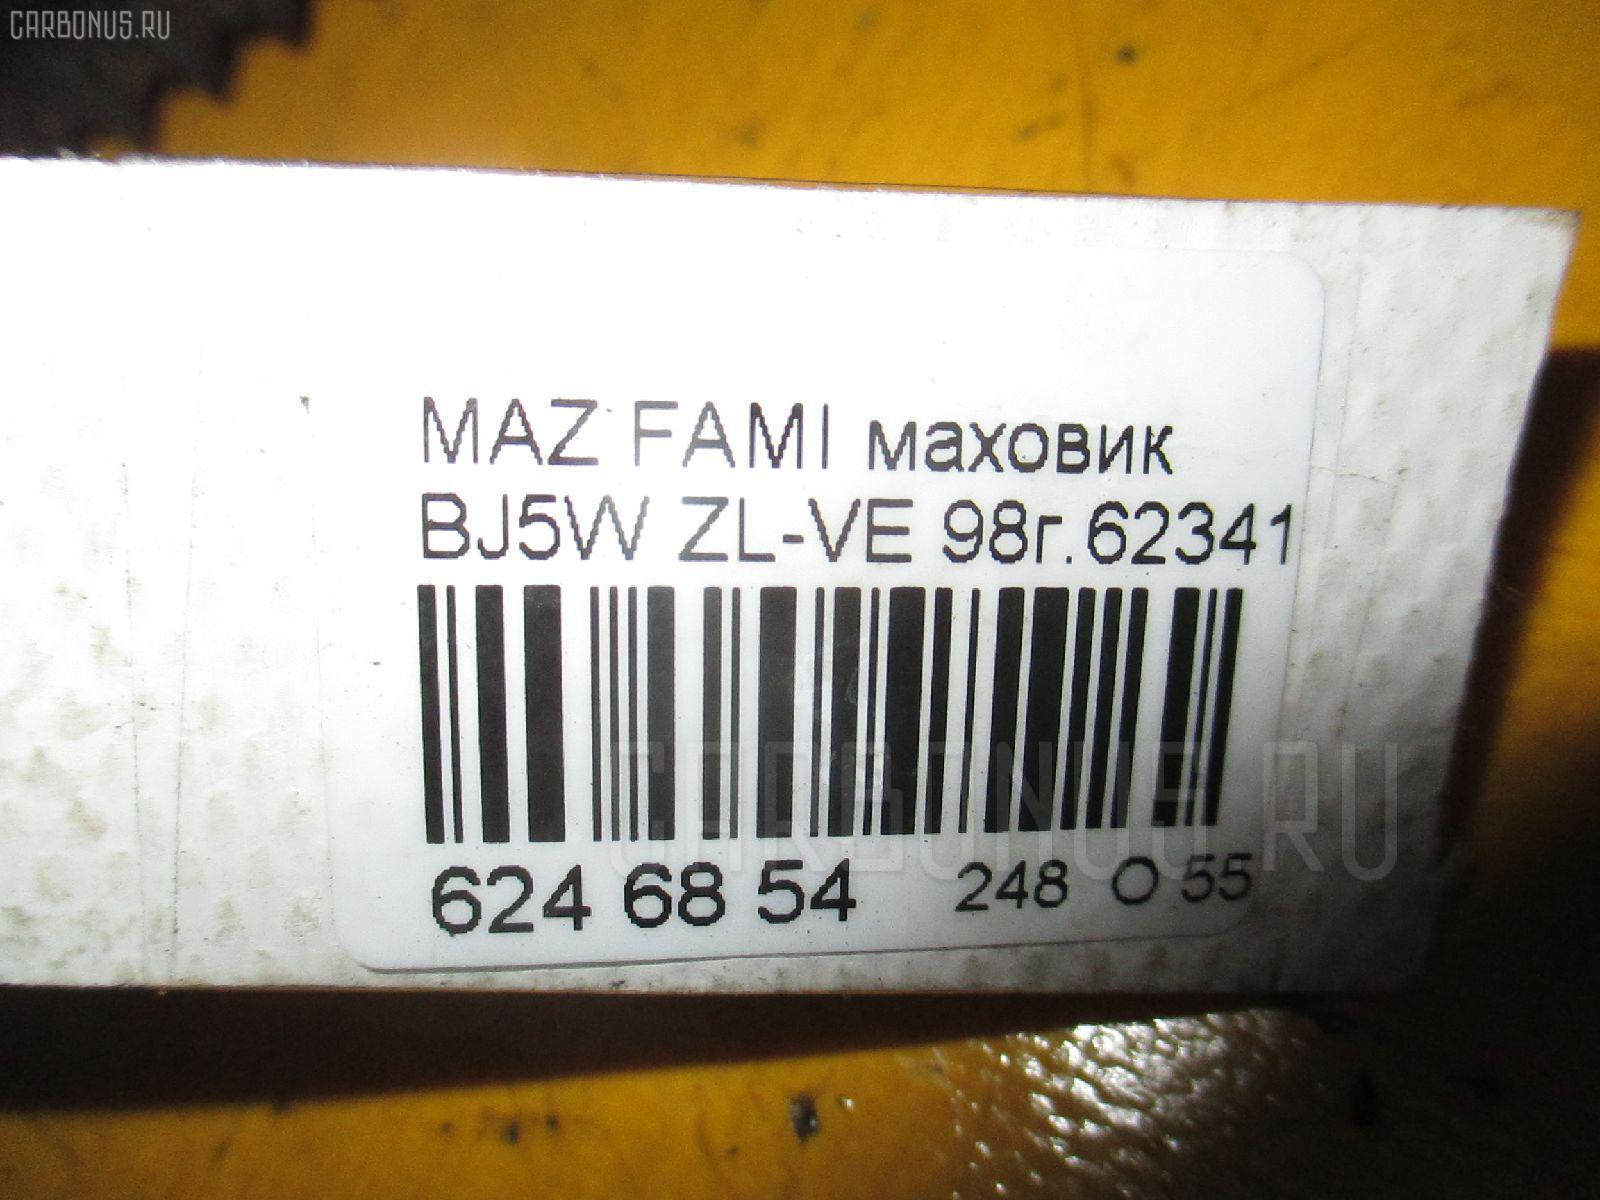 Маховик MAZDA FAMILIA S-WAGON BJ5W ZL-VE Фото 3